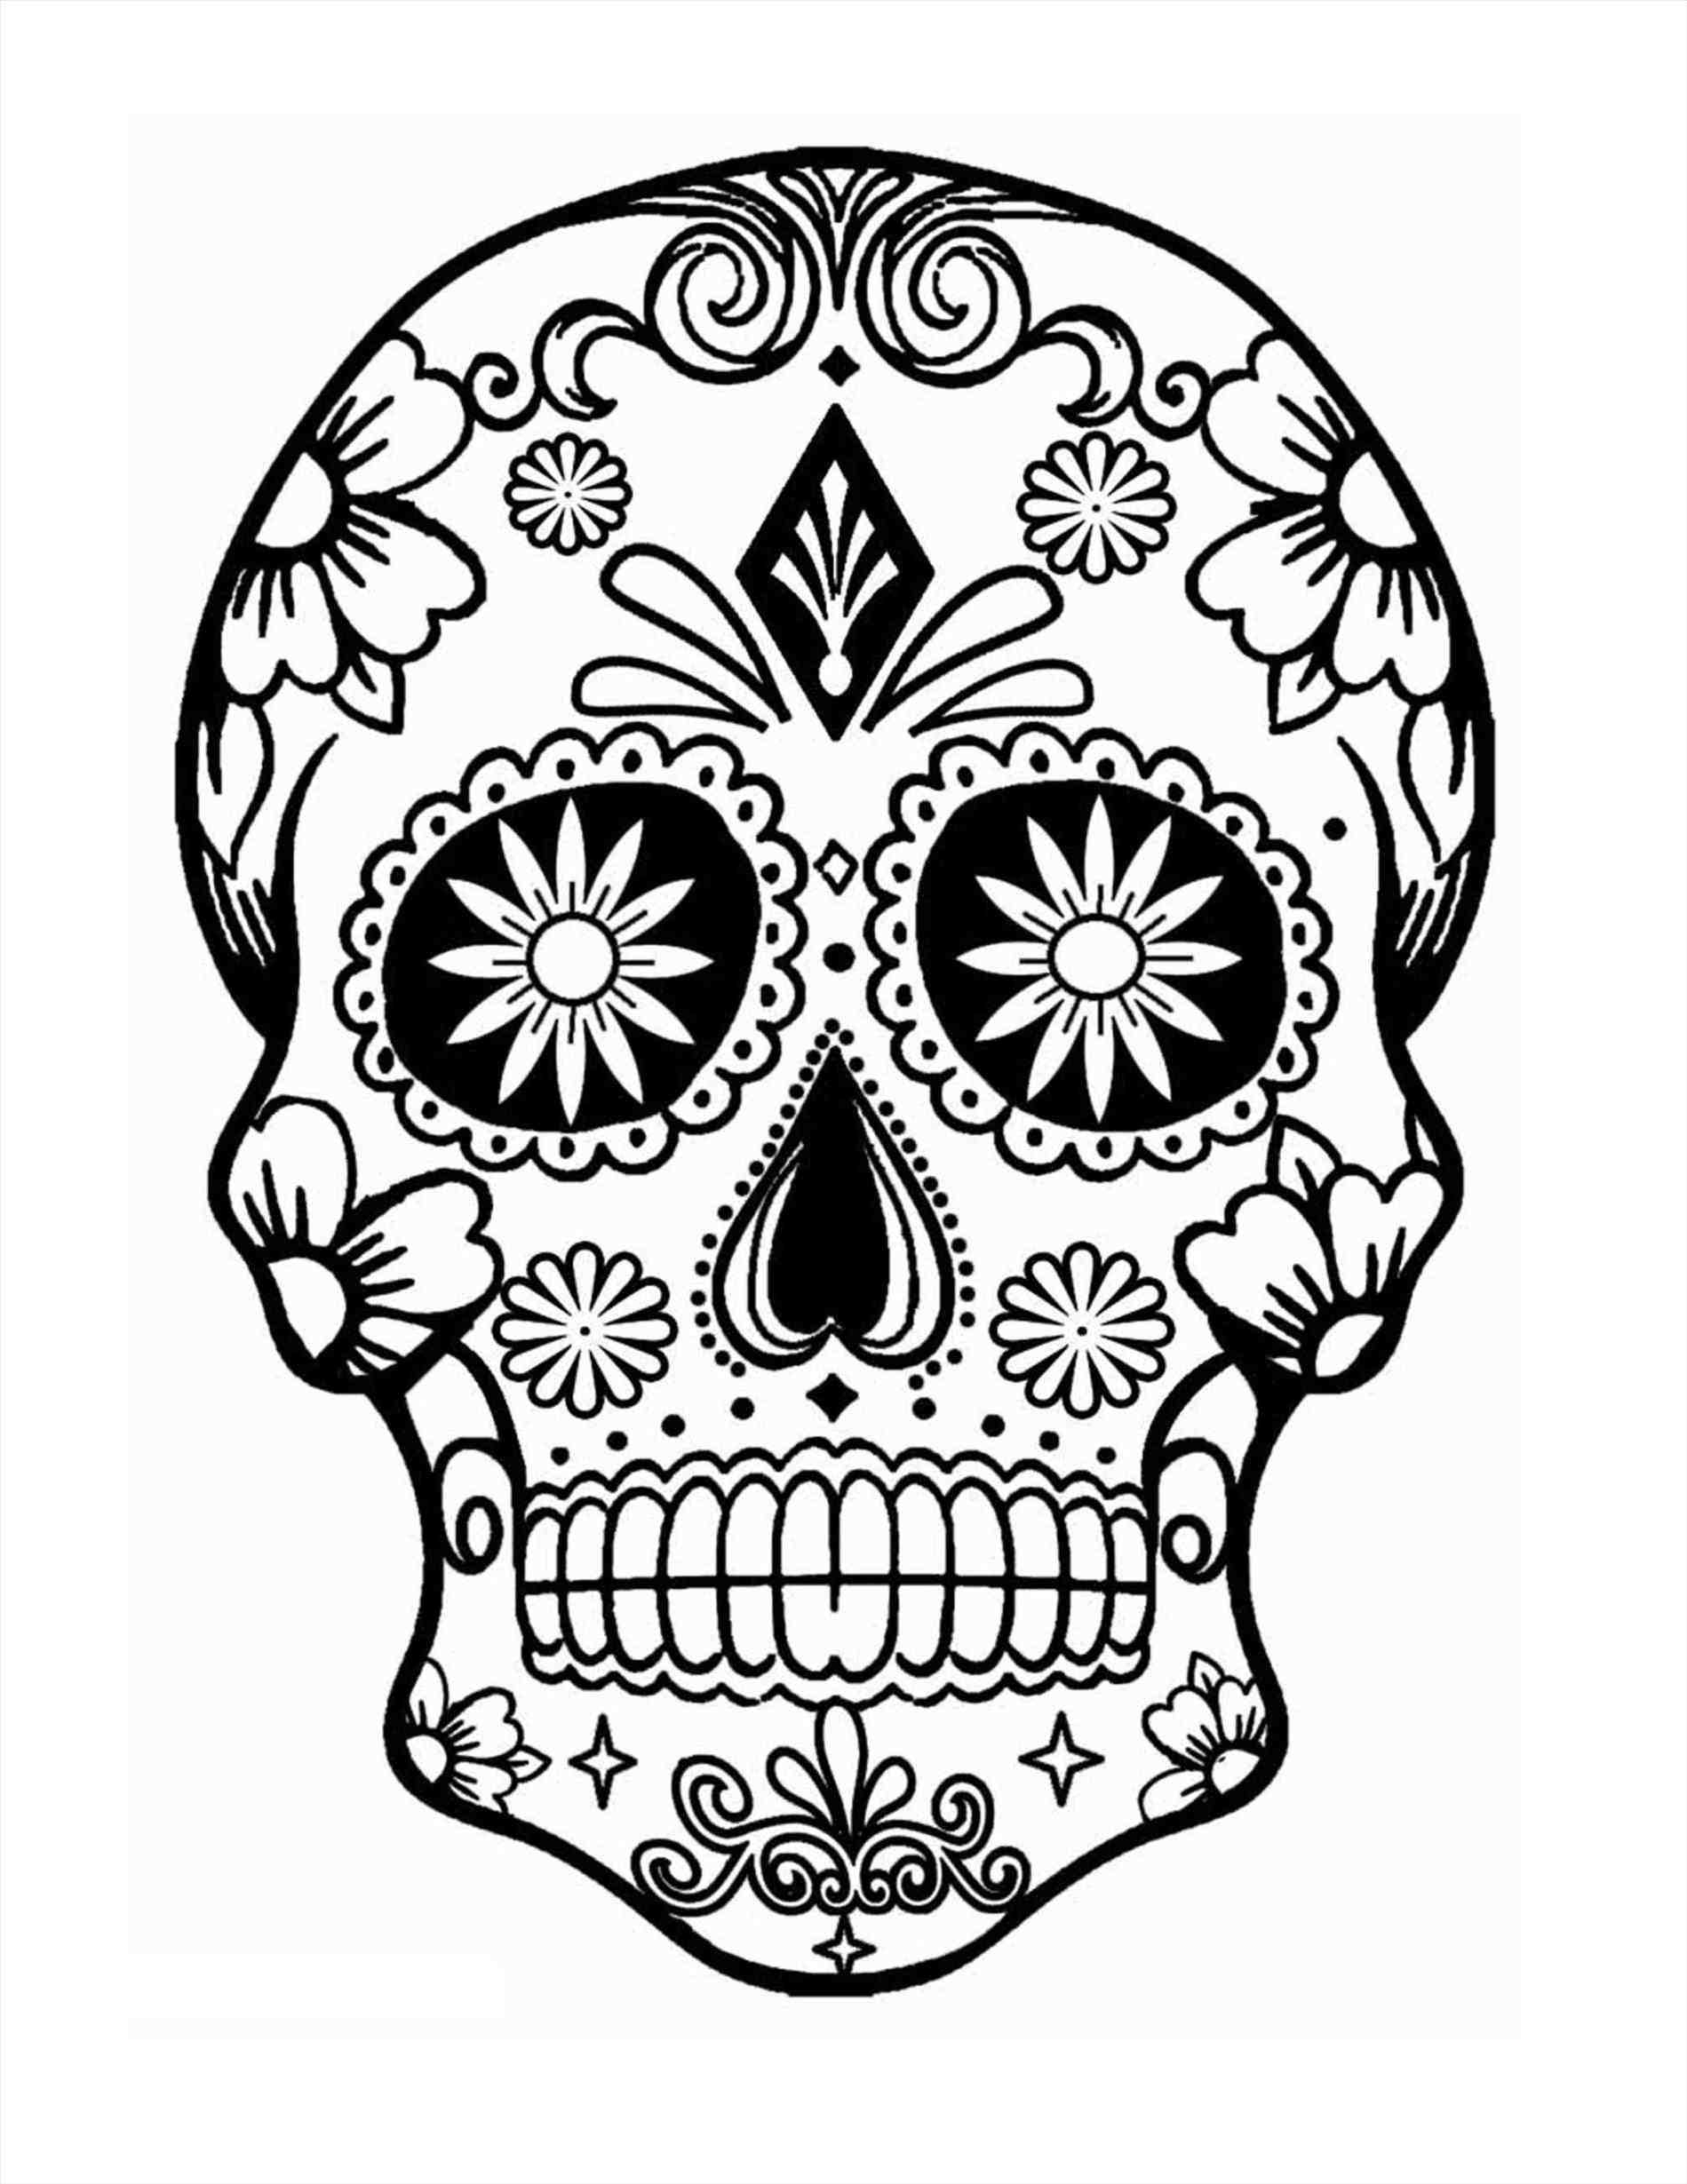 1899x2459 Ariel Drawing Sugar Skull For Free Download